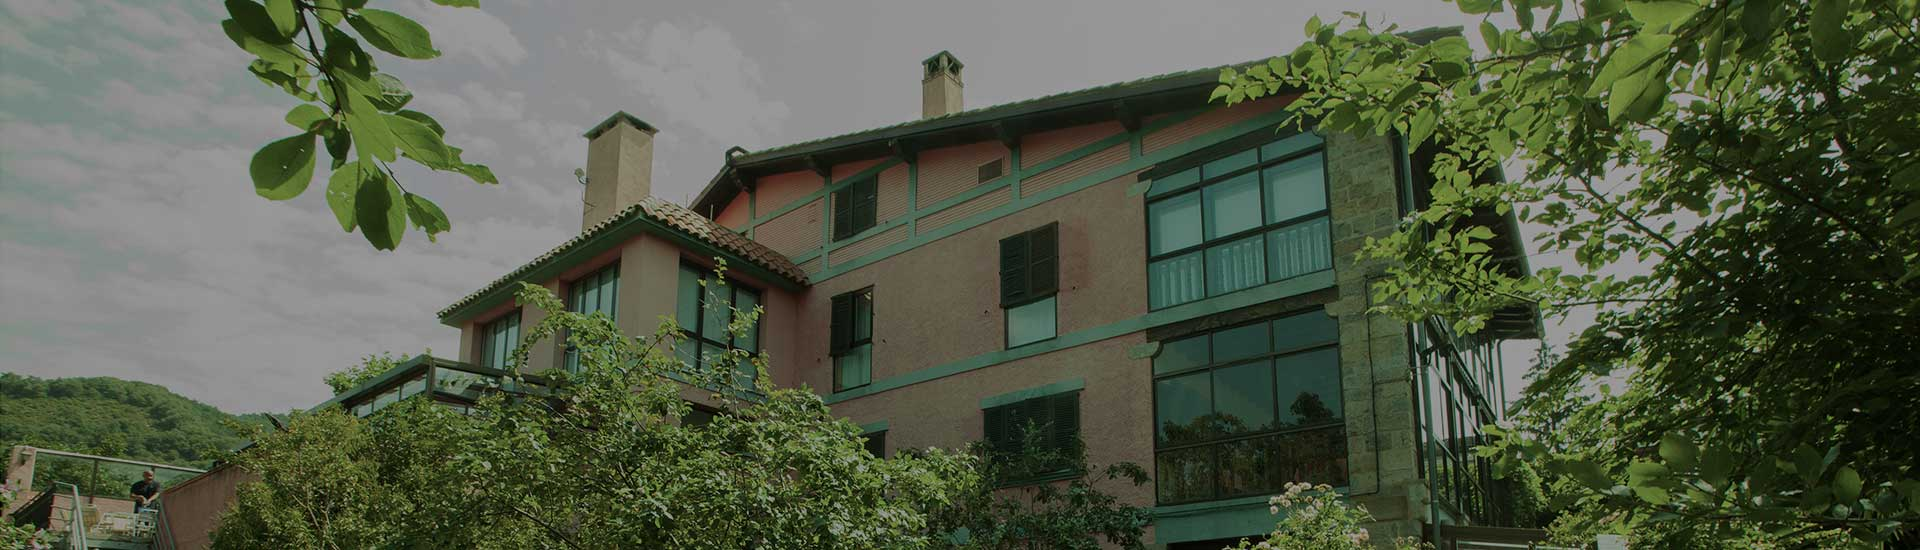 titulo-pagina-hotel-jardin-oscura